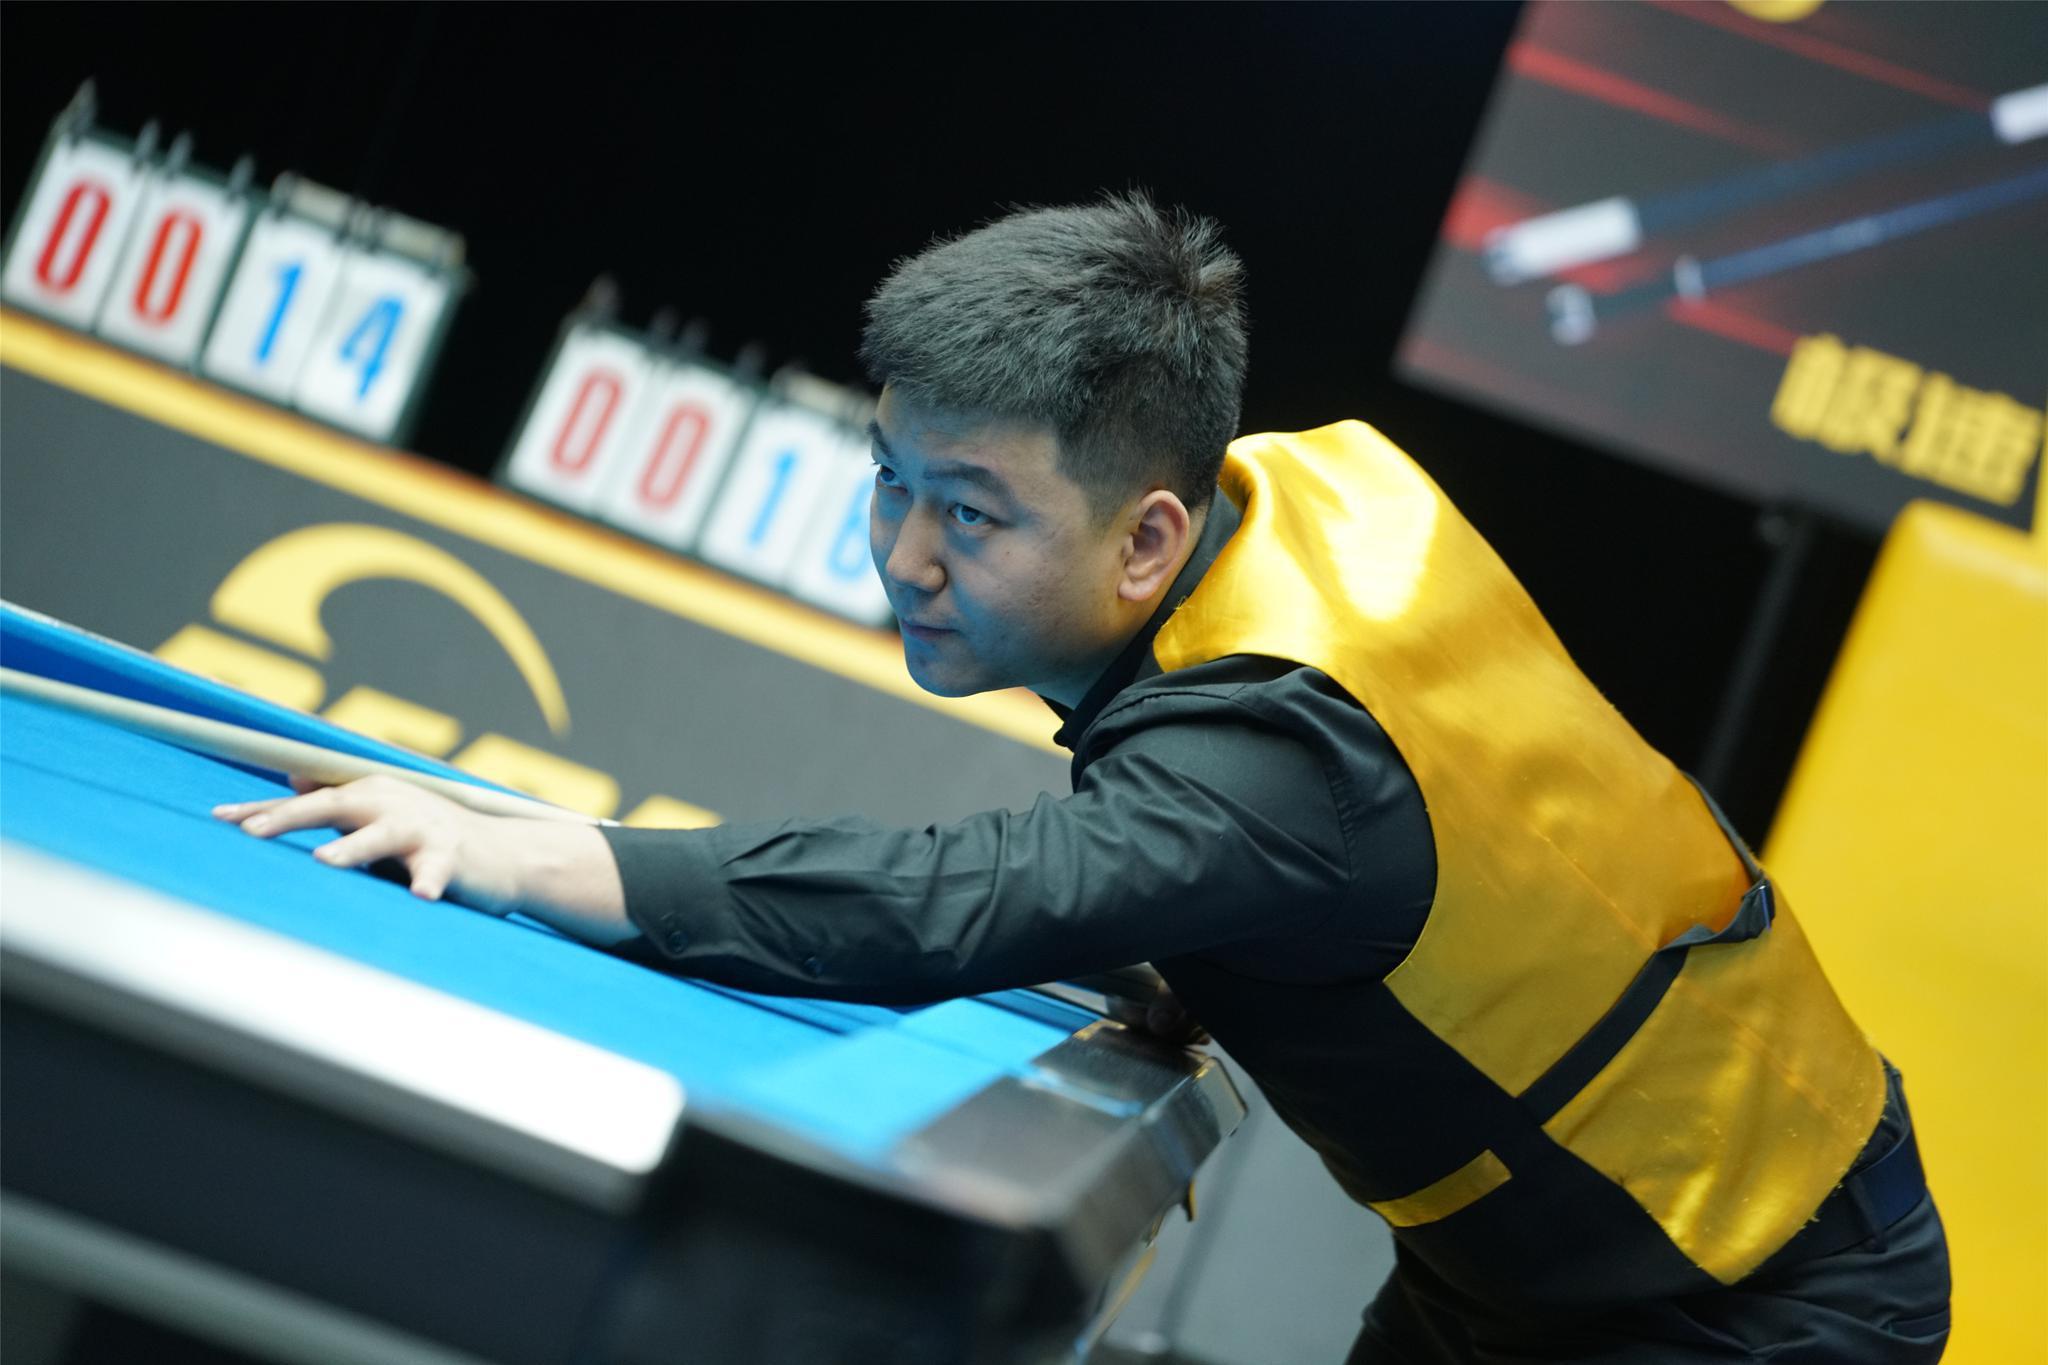 【LCBA中式九球擂台赛】马红军最后一局绝杀对手,晋级四强